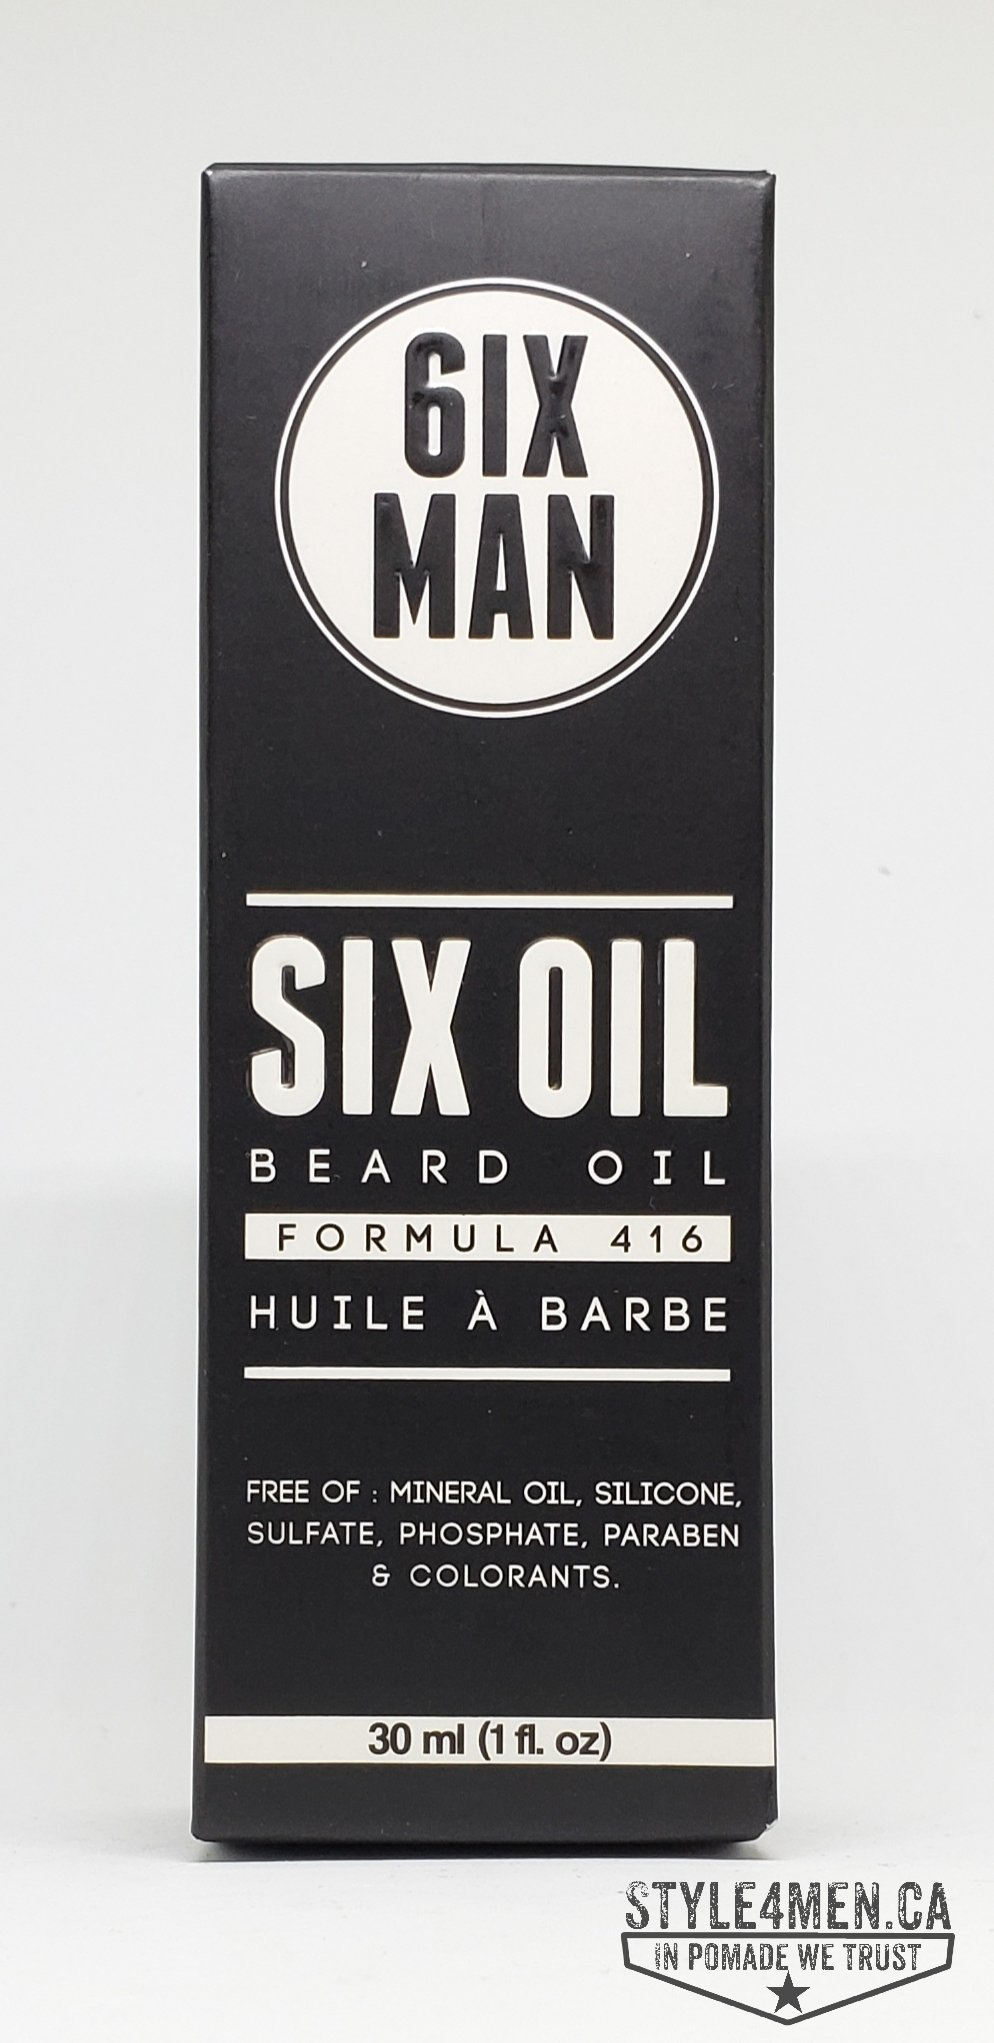 6IX MAN Beard Oil